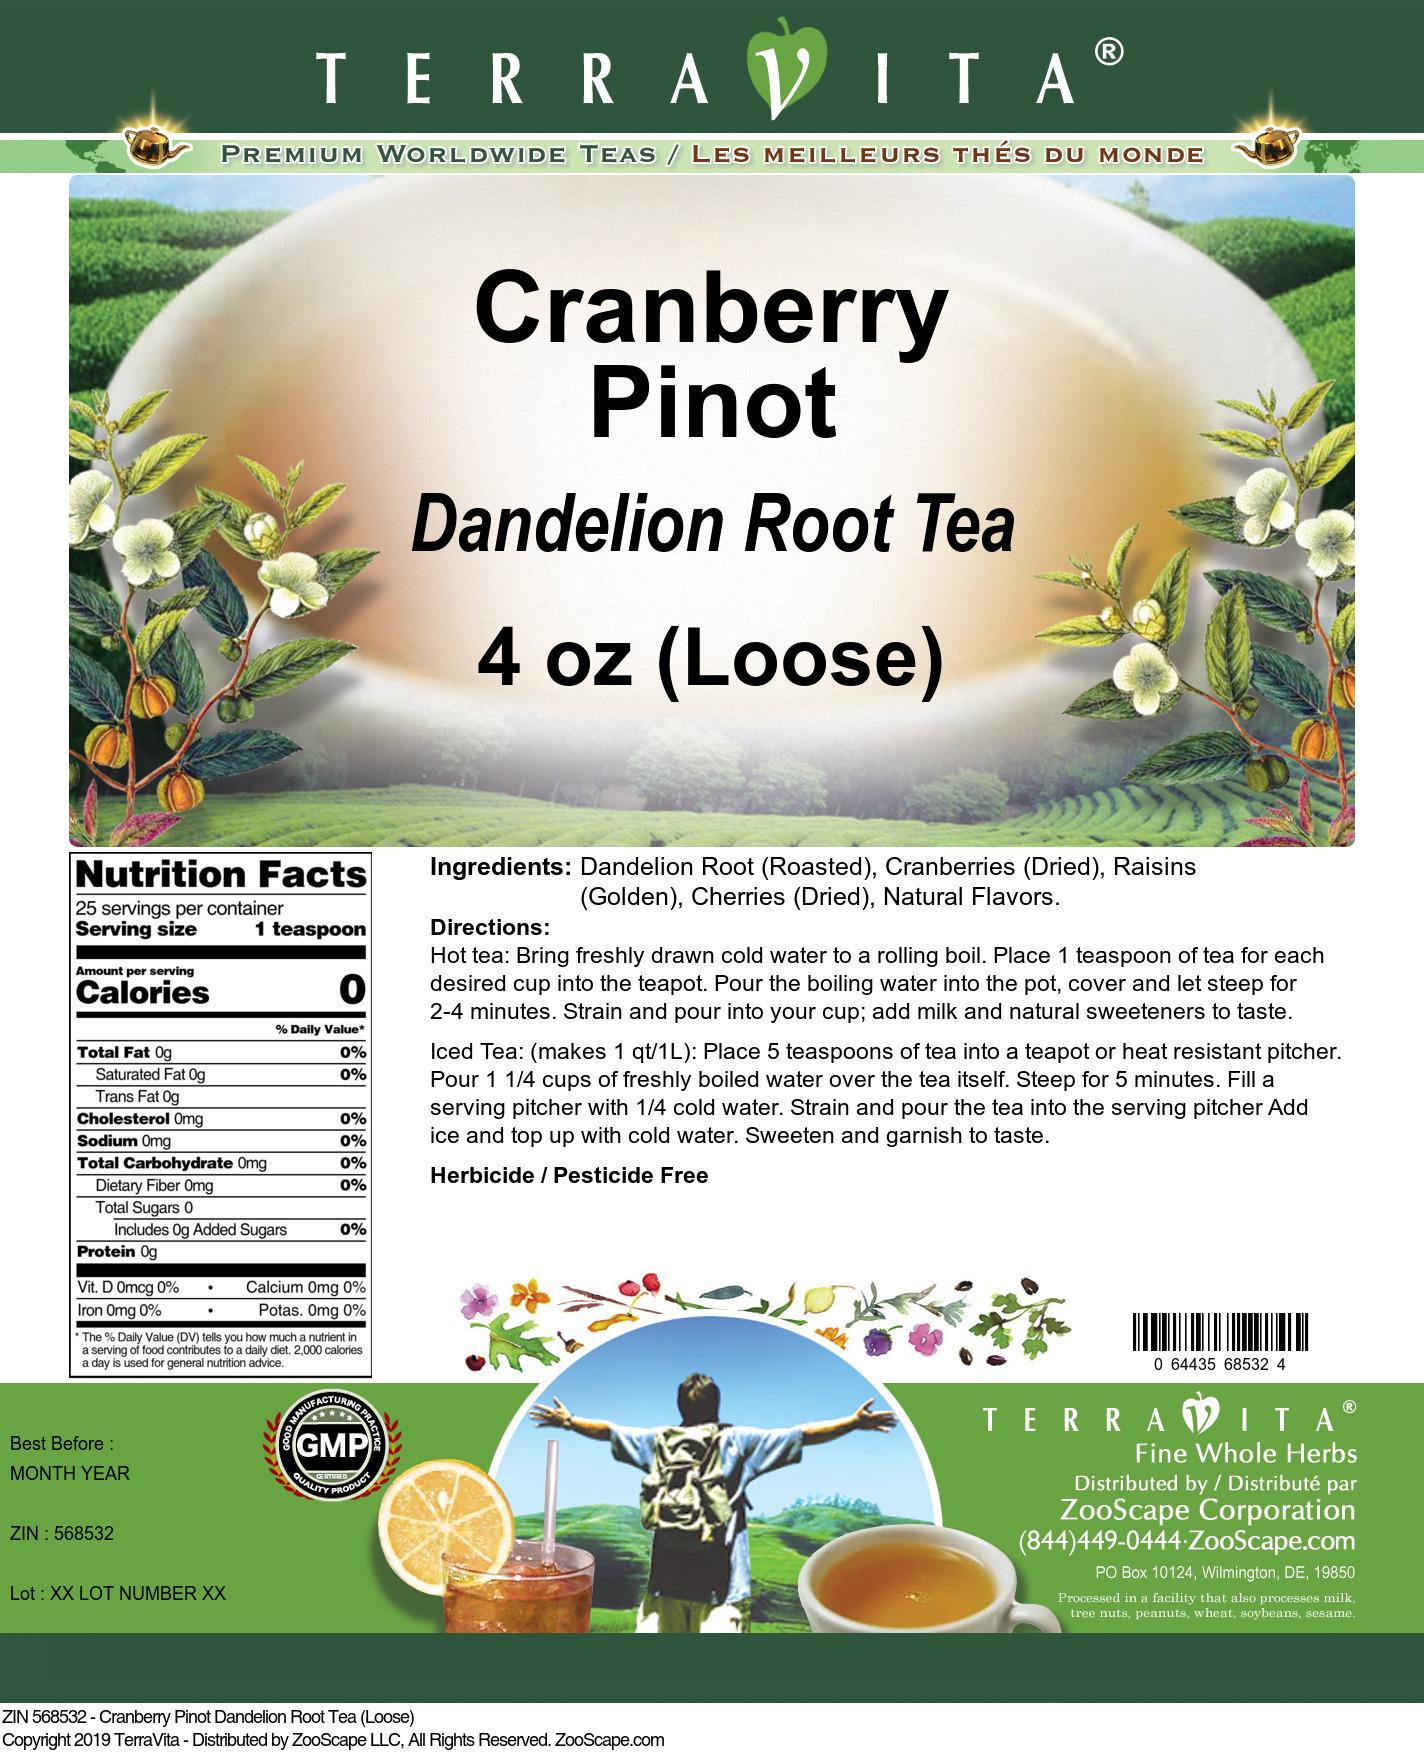 Cranberry Pinot Dandelion Root Tea (Loose)